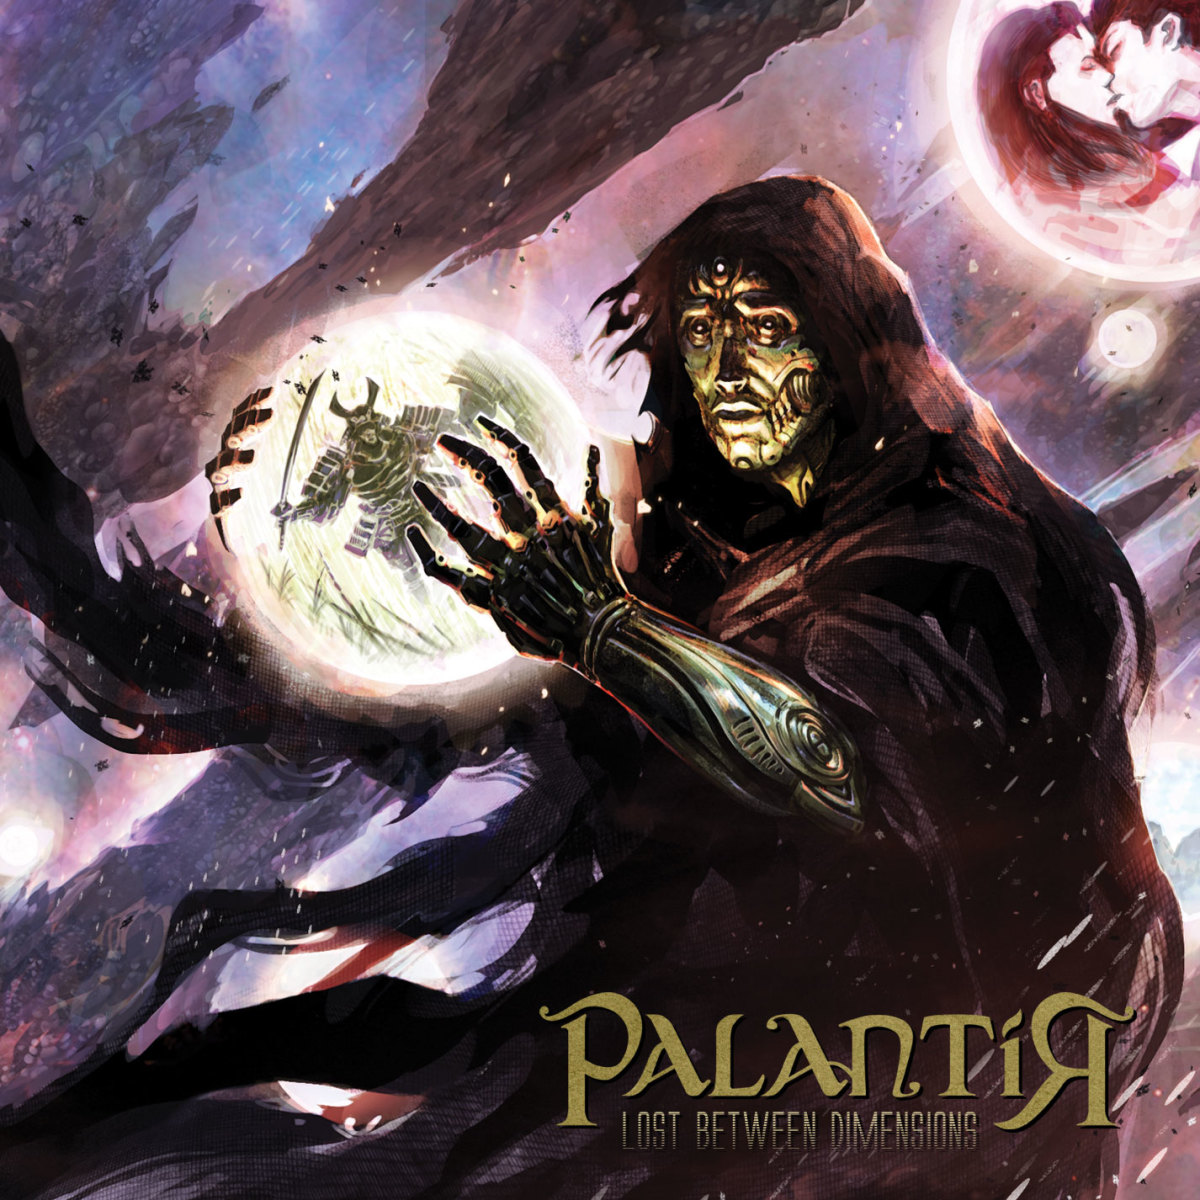 palantir-lost-between-dimensions-2017-album-review